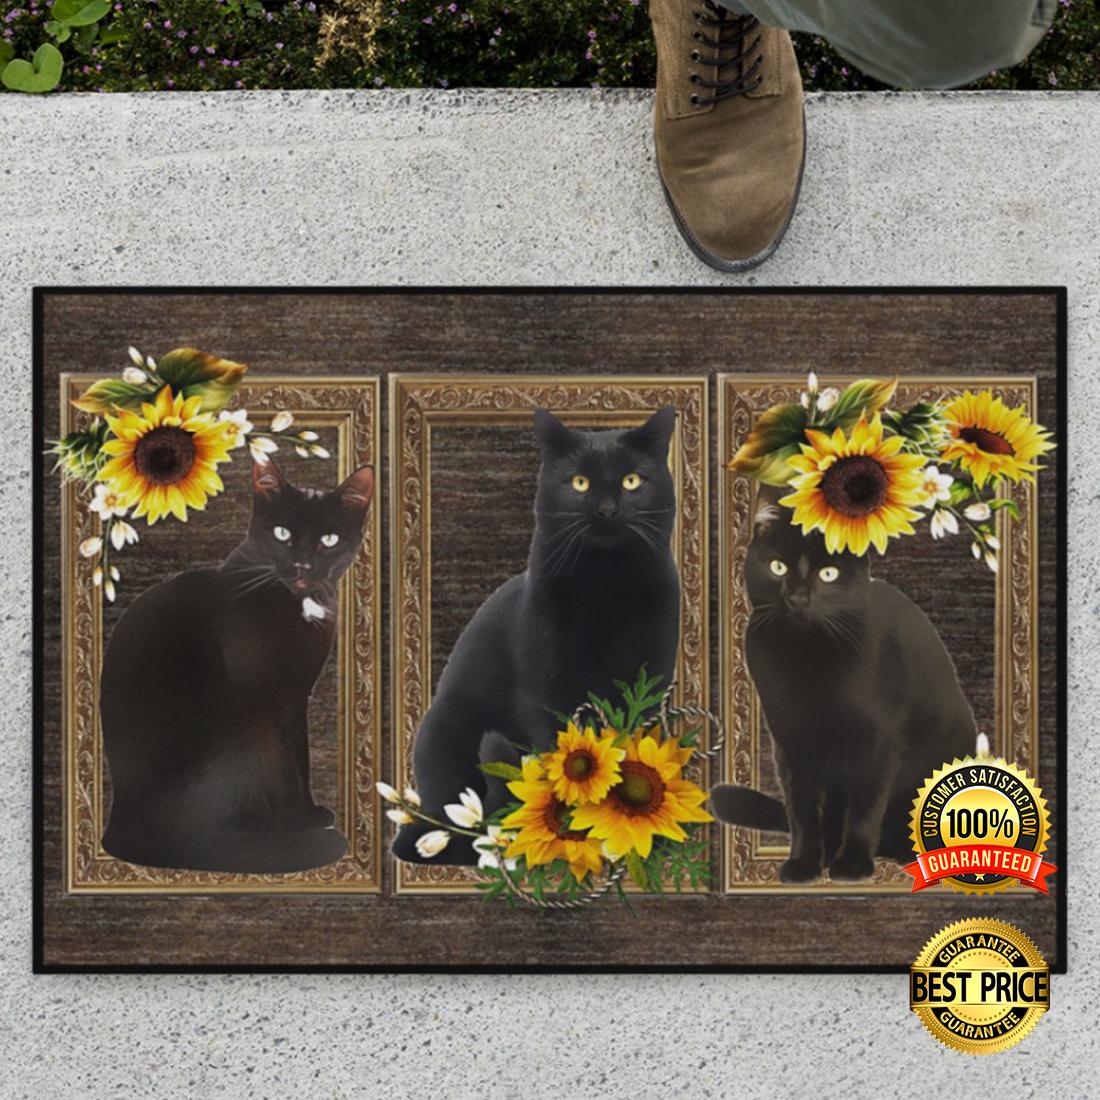 Black cat sunflower frame doormat 4